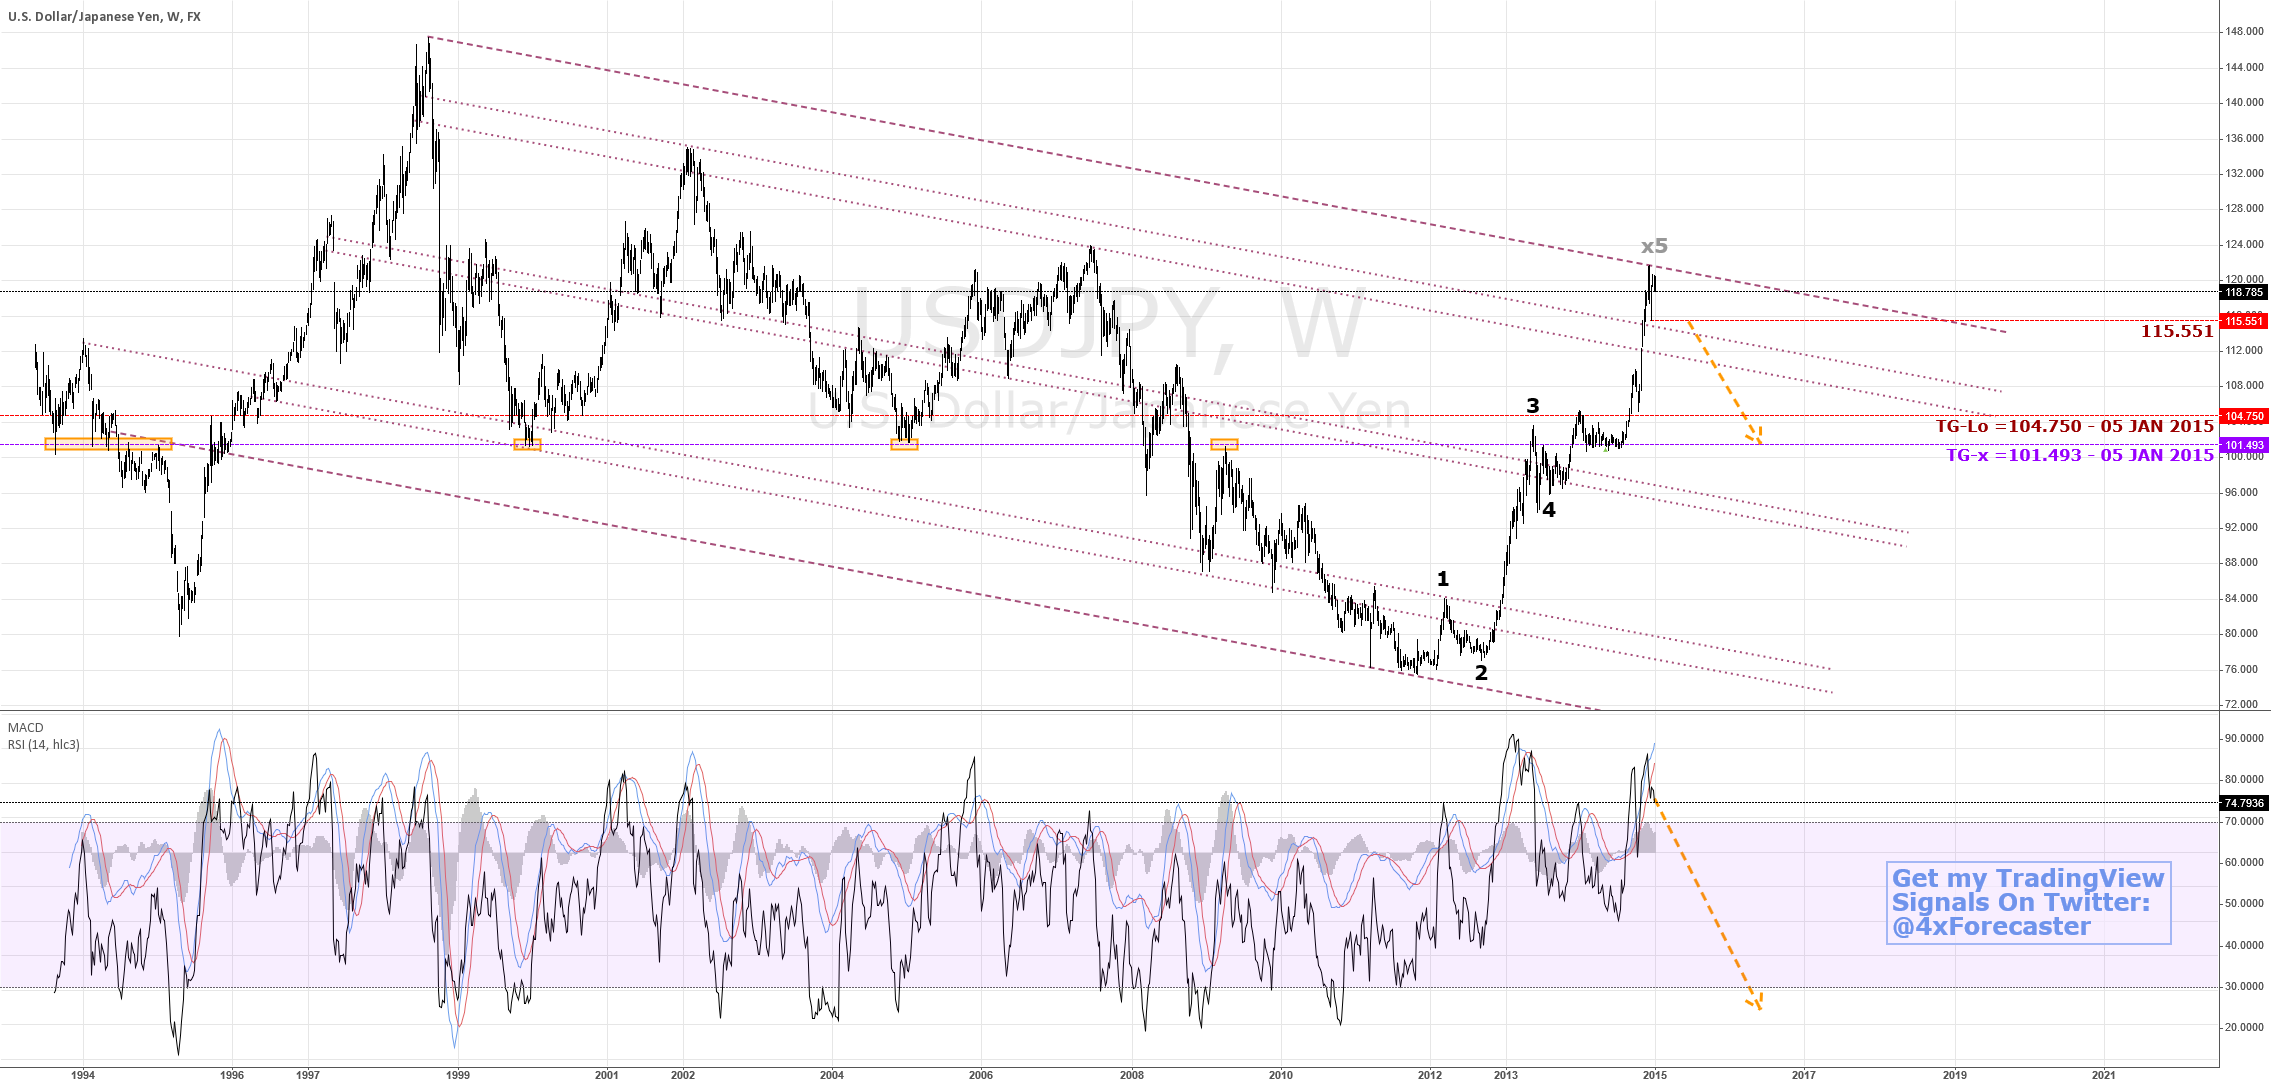 Potential Reversal To 101.493 | $JPY $USD $Nikkei #BOJ #forex